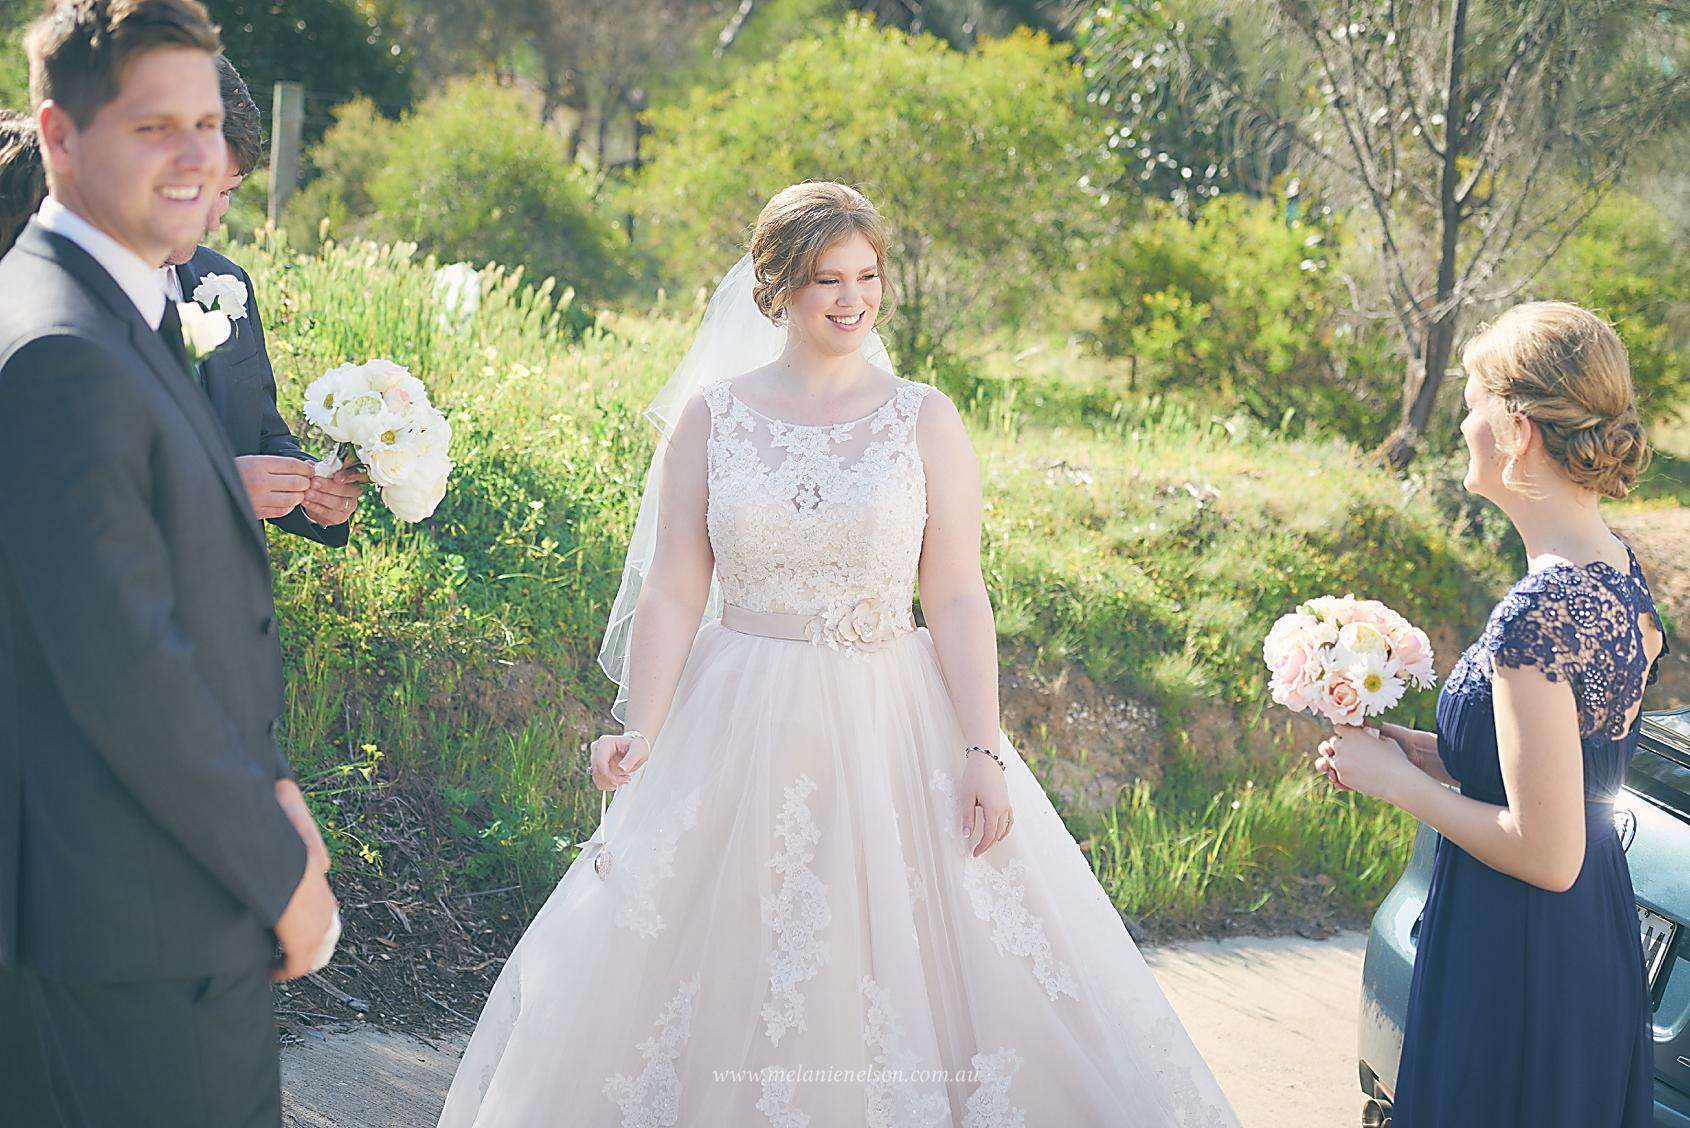 yorke_peninsula_wedding_photographer_0048.jpg